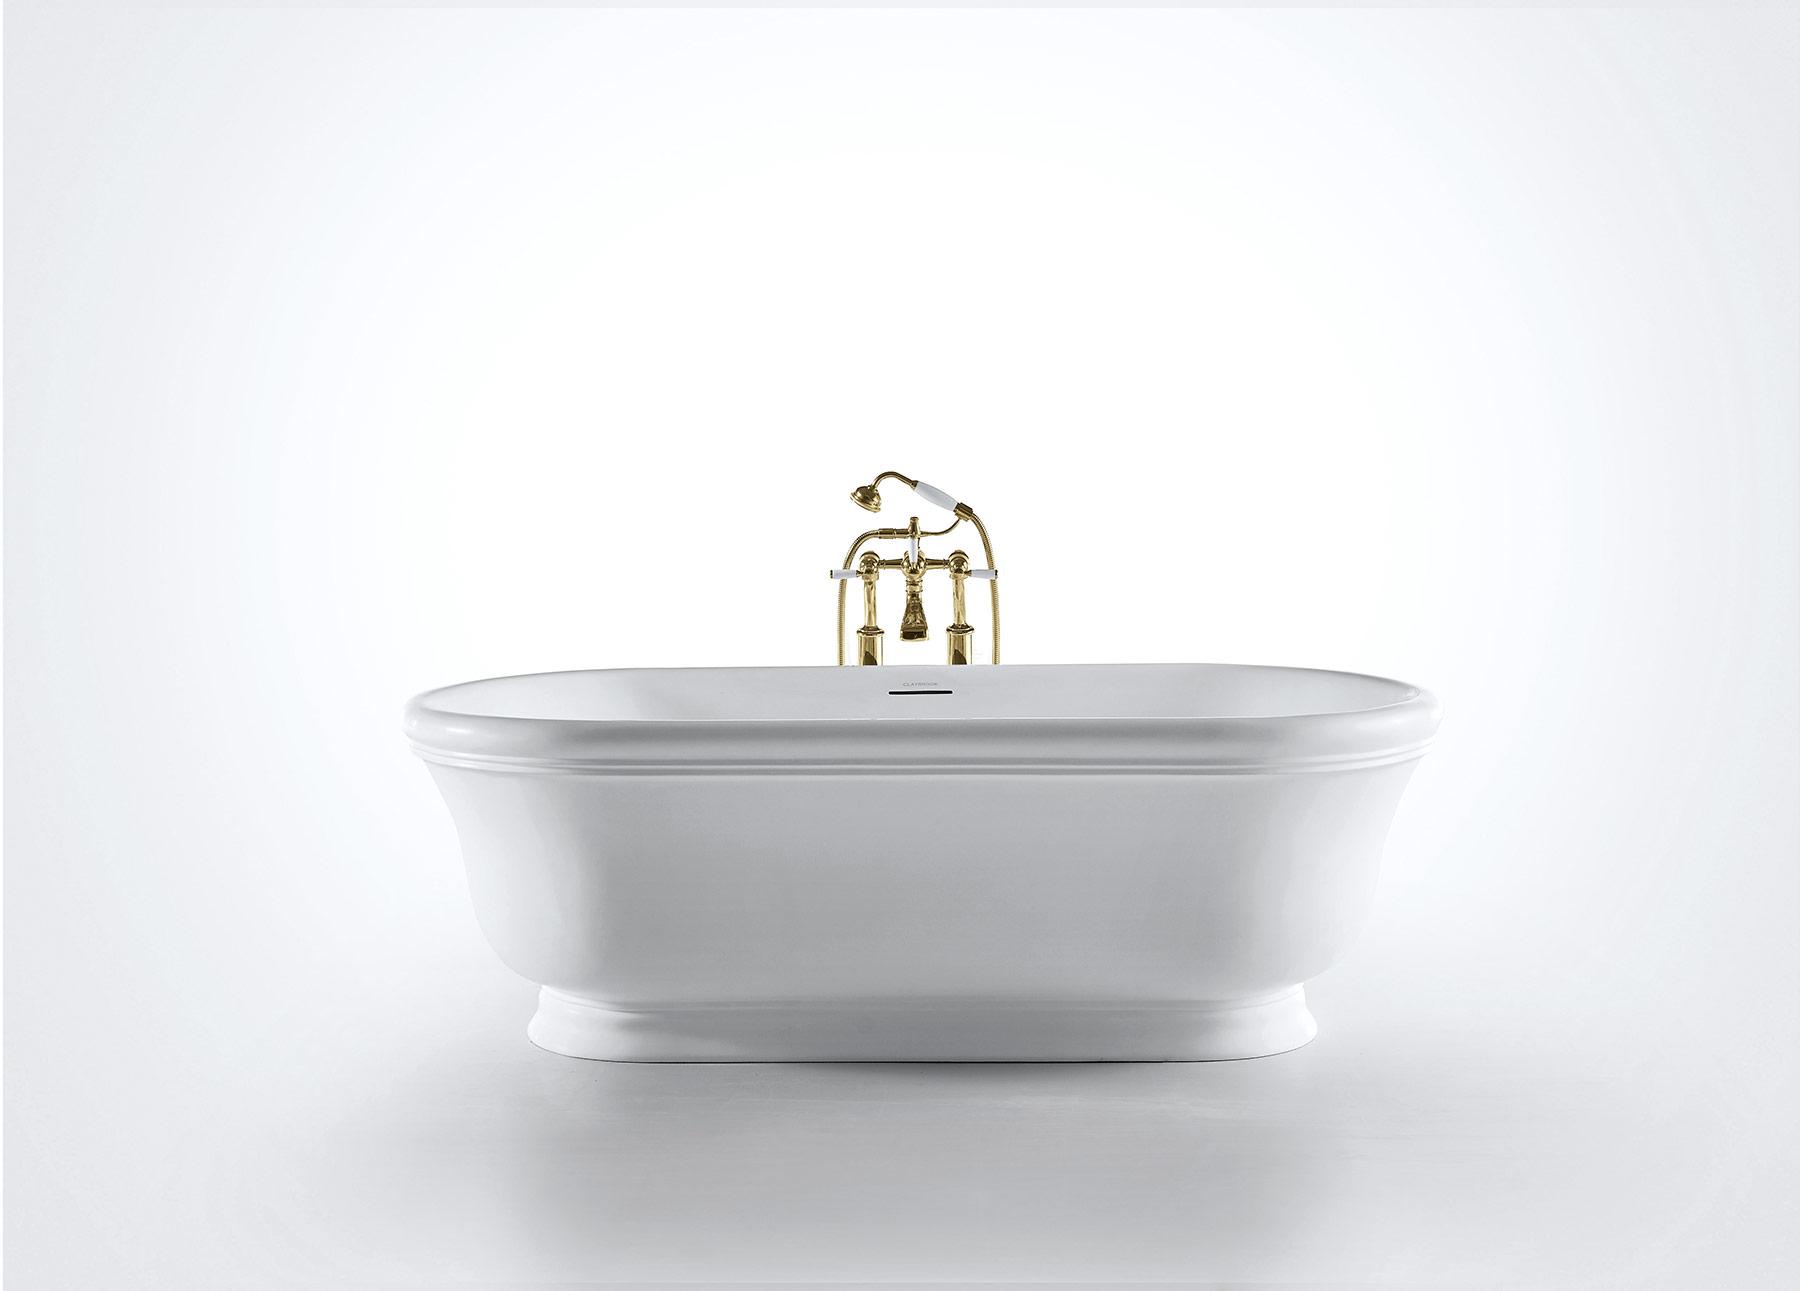 Traditional Devonshire Freestanding Bathtub